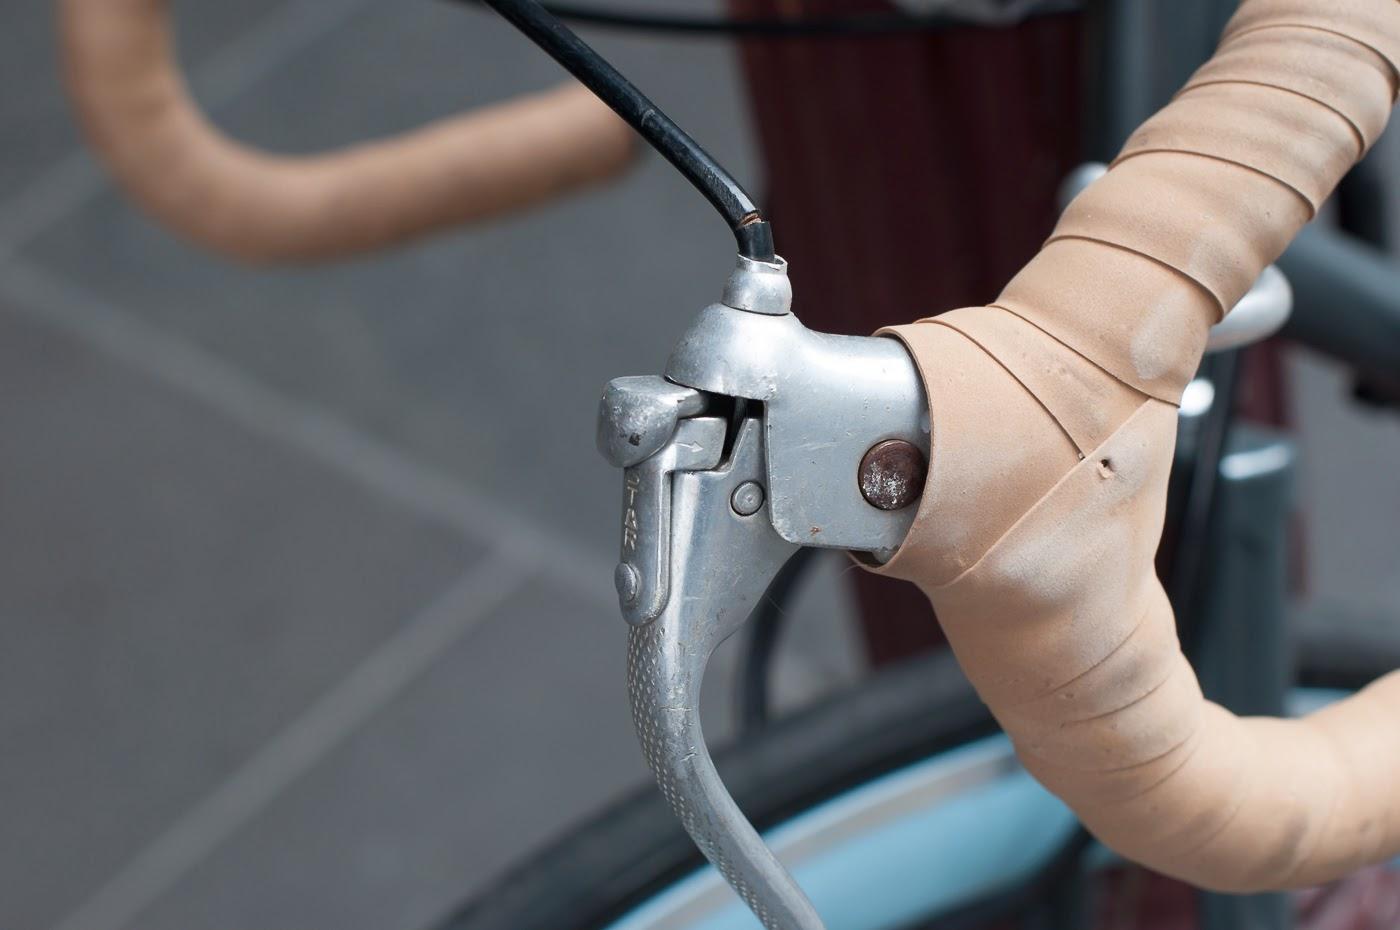 single speed, bike, bicycle, tim macauley, the biketorialist, melbourne, conversion, road bike,  bourke st, custom, frame, vintage, brake lever, lever